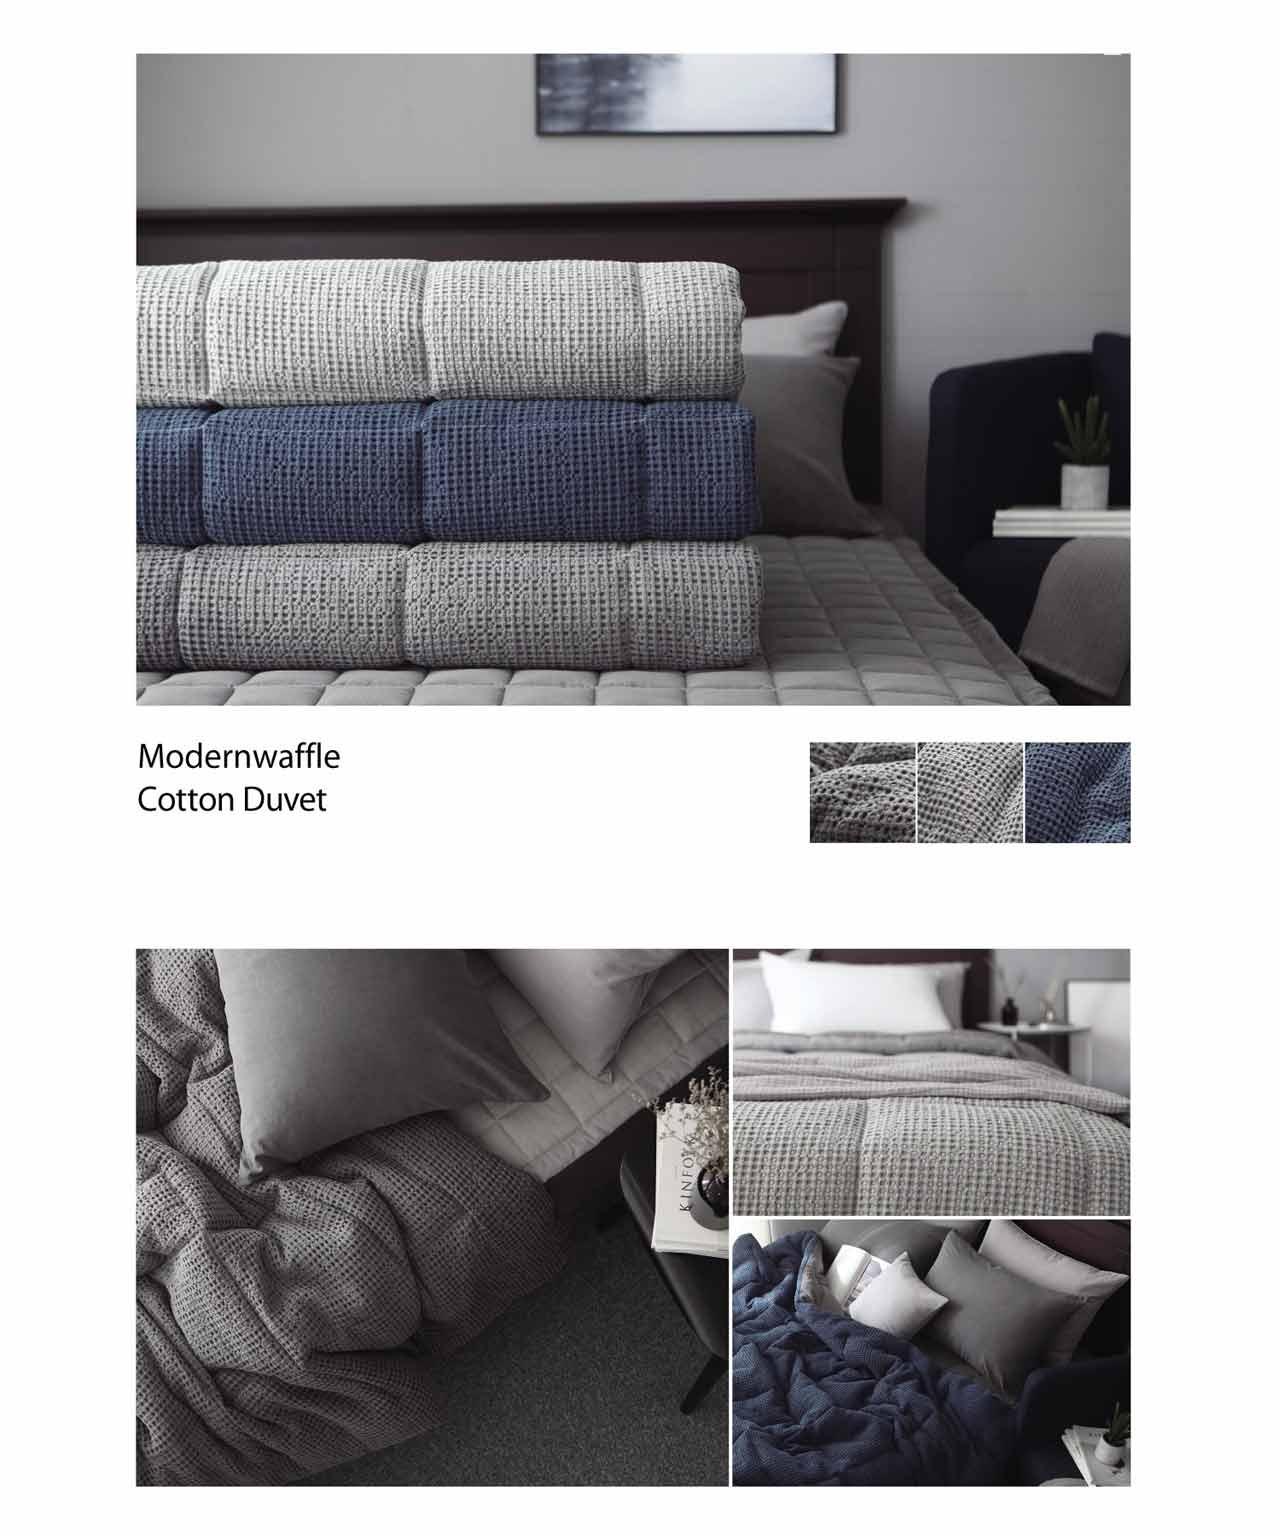 Chăn mền ga gối Hàn Quốc Modernwaffle Cotton`